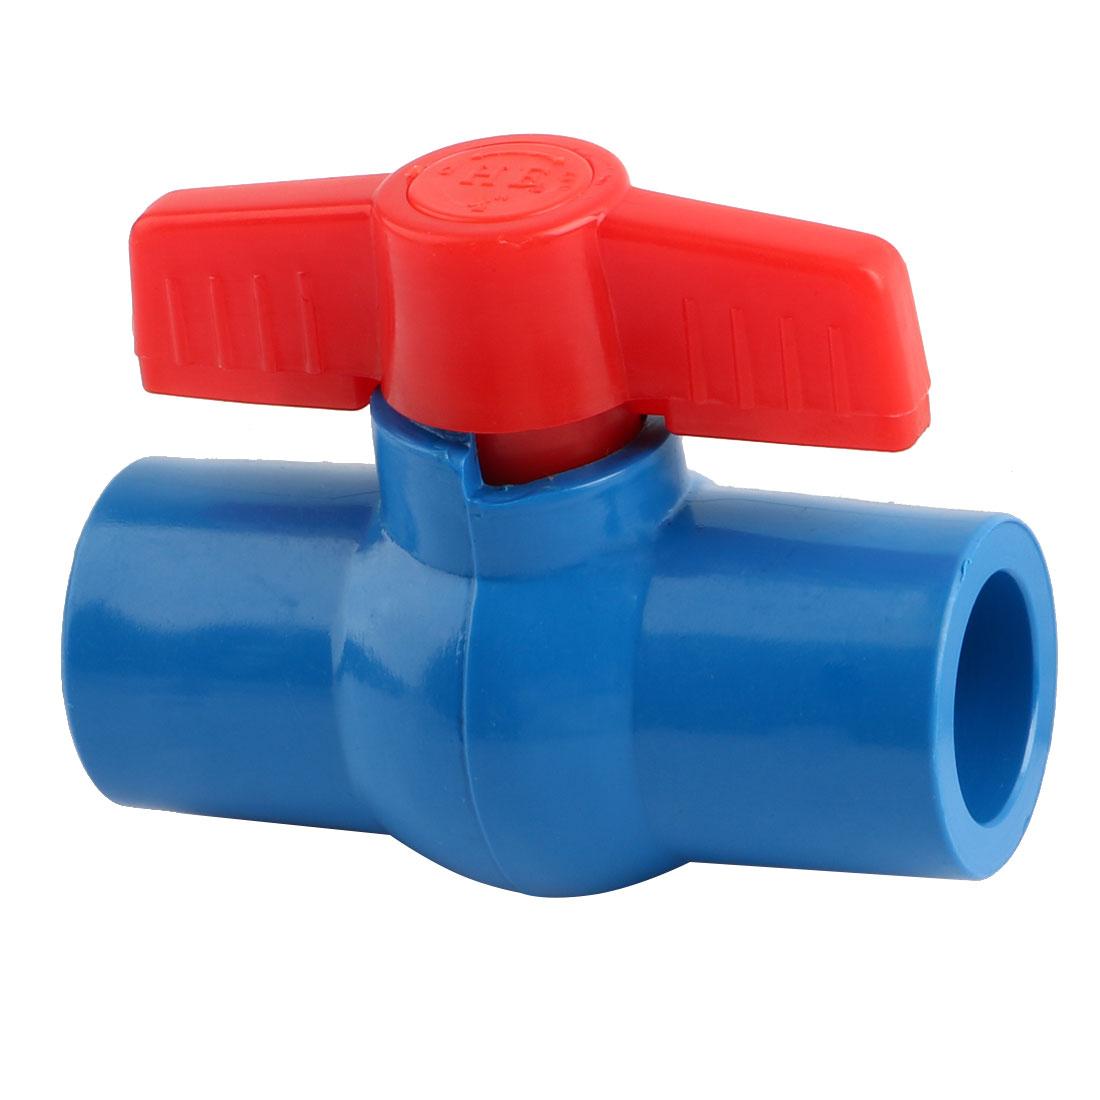 Water Supply Plastic Pipe Tap Faucet Ball Valve Blue Red Inner Diameter 20mm